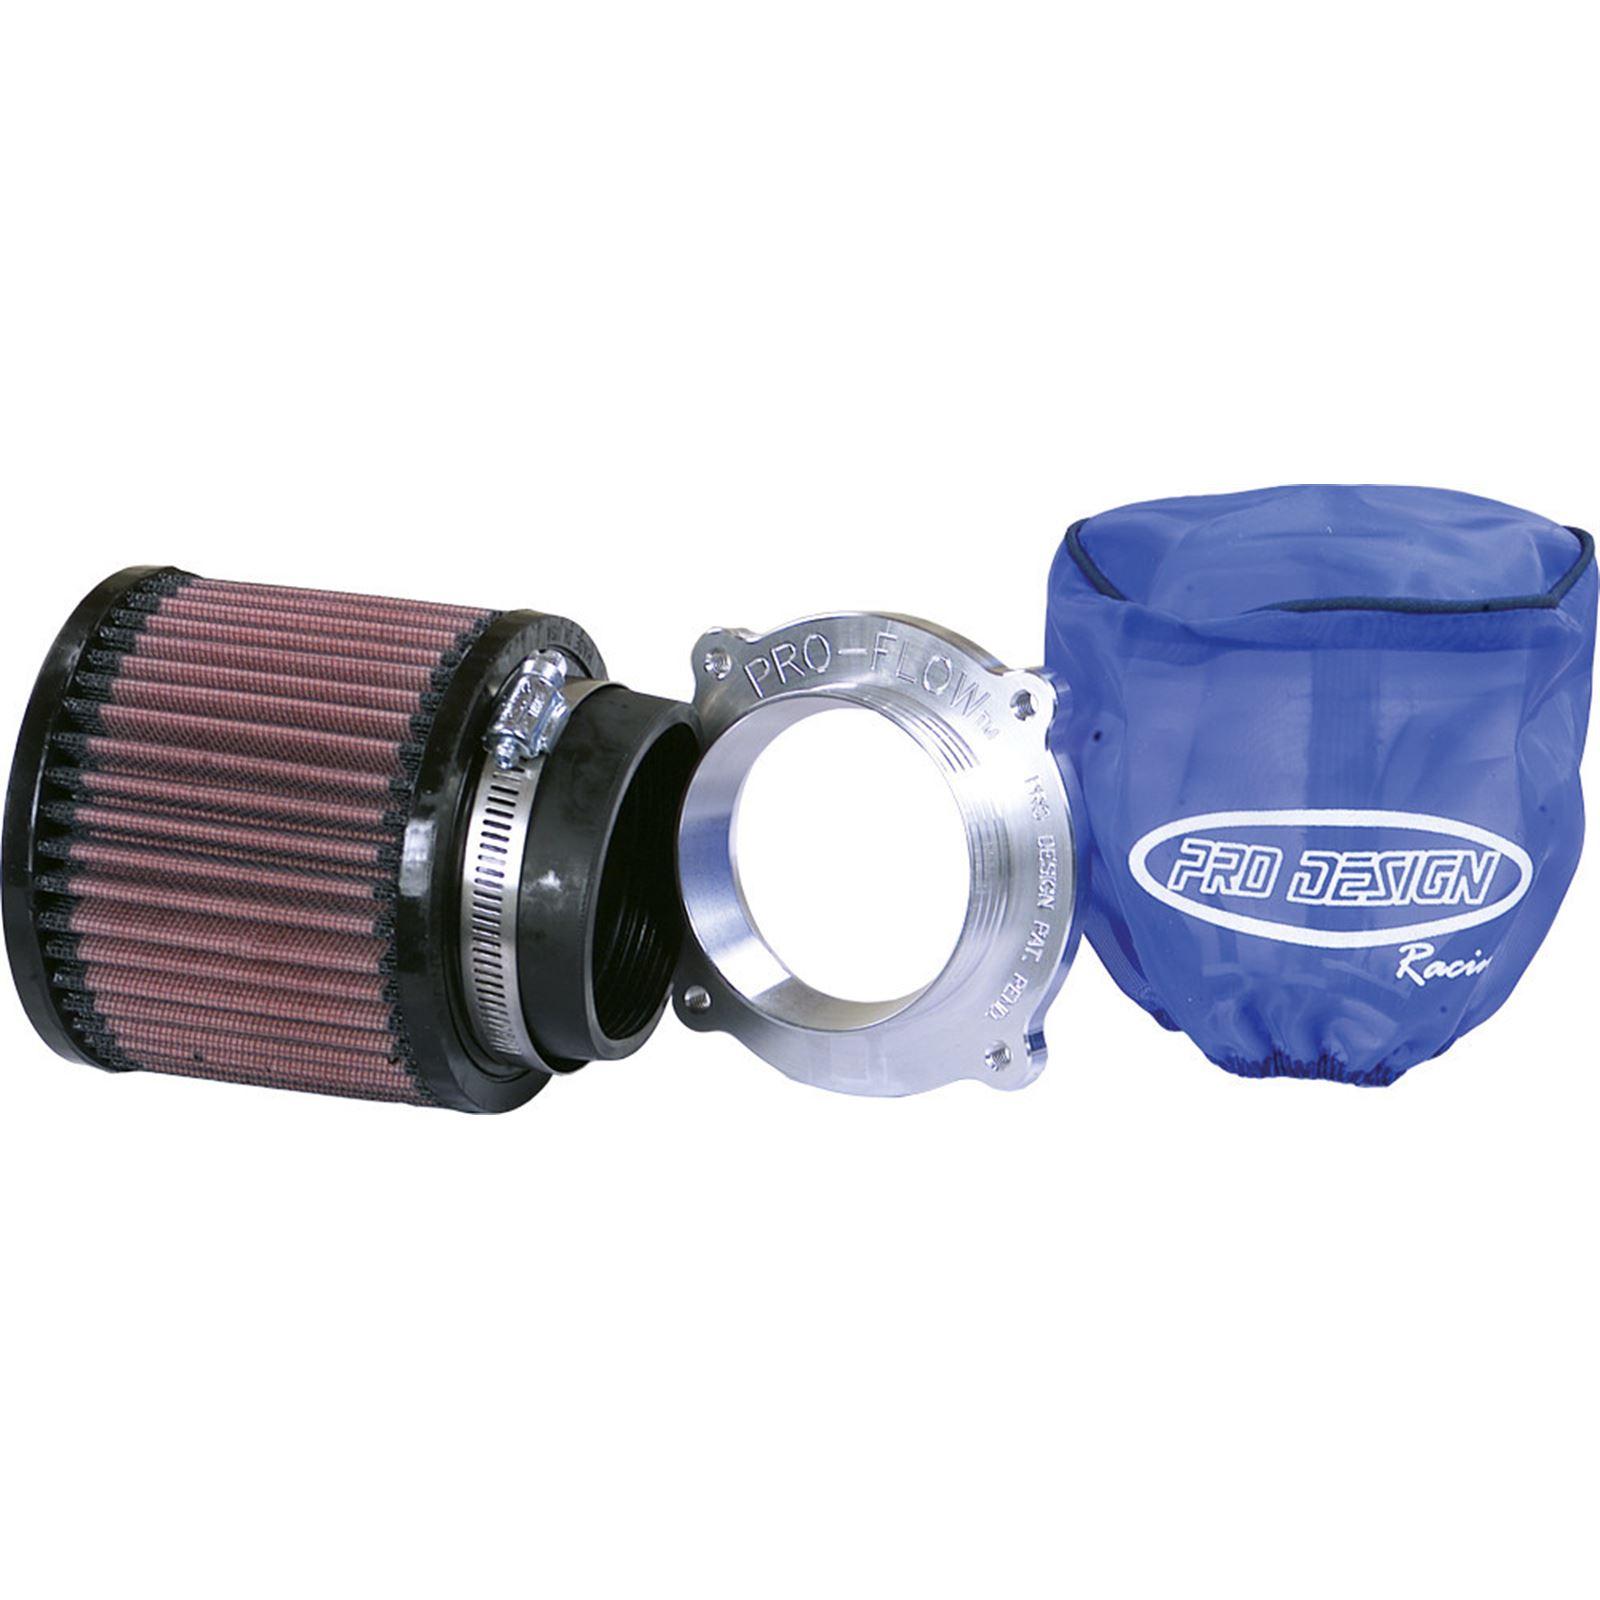 Pro Design Pro Flow K&N Air Filter Kit